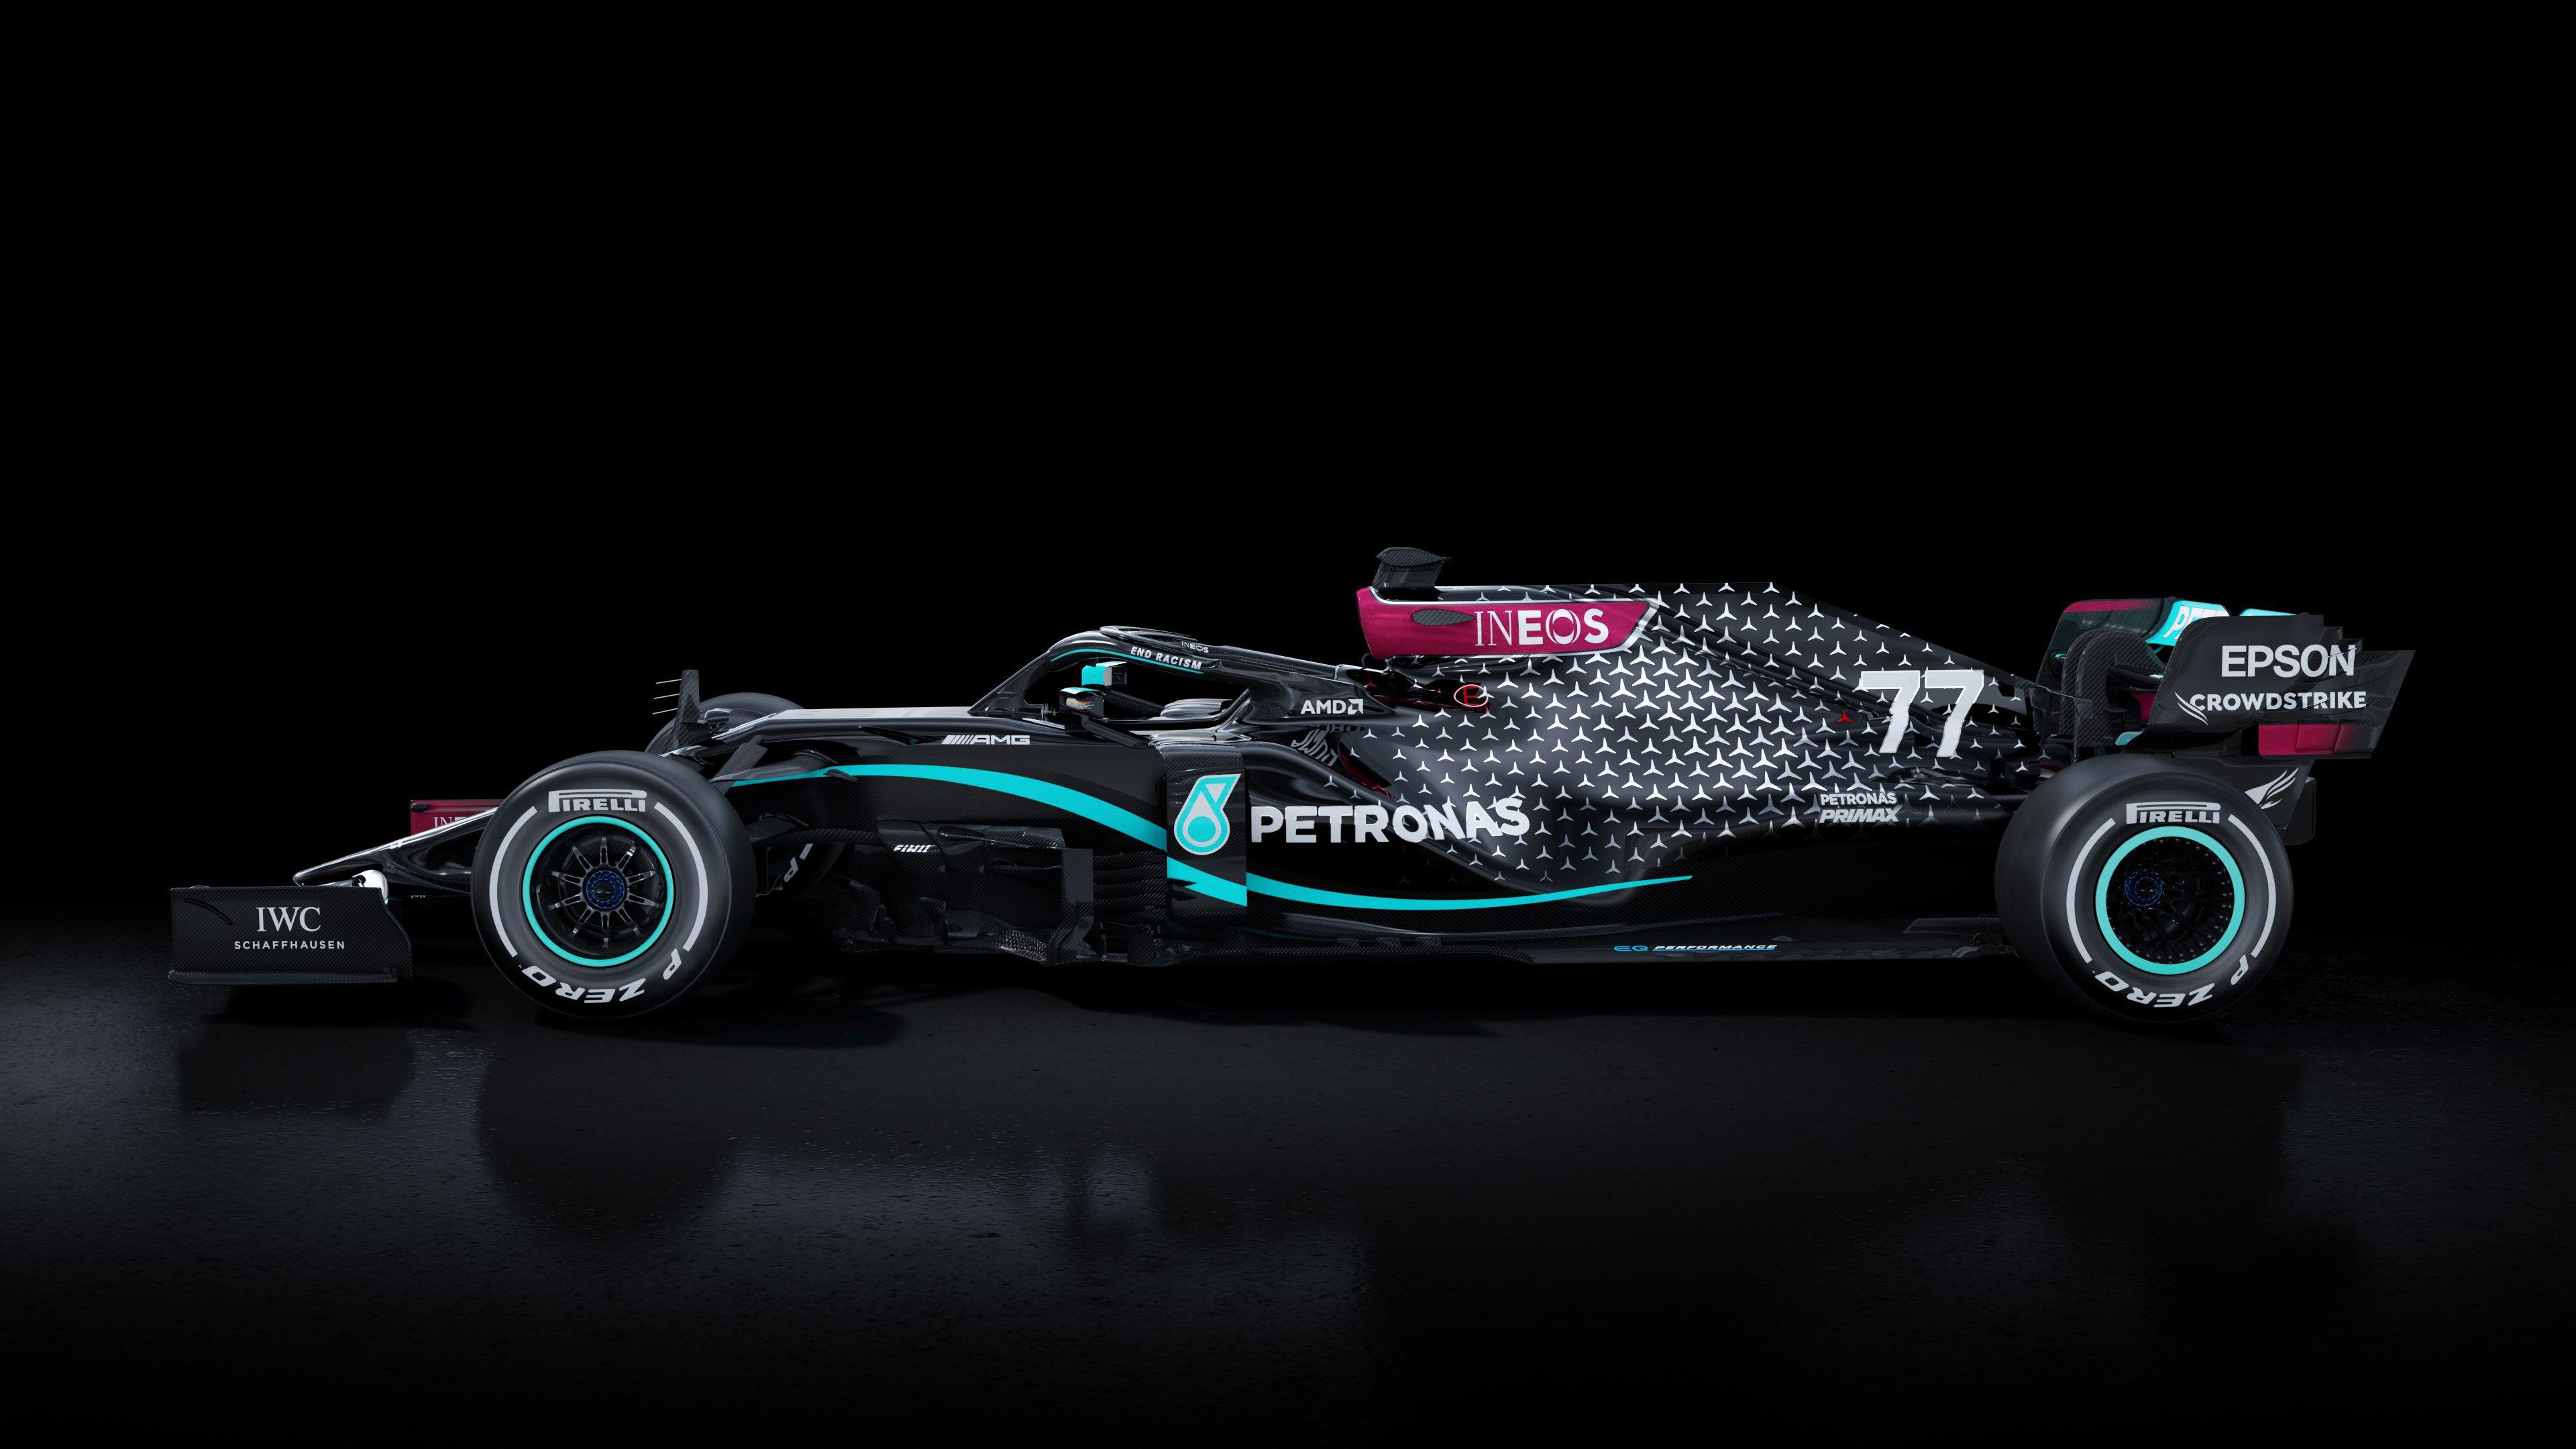 Mercedes AMG F1 W11 EQ Performance 2020 4K Wallpaper HD Car 3840x2160